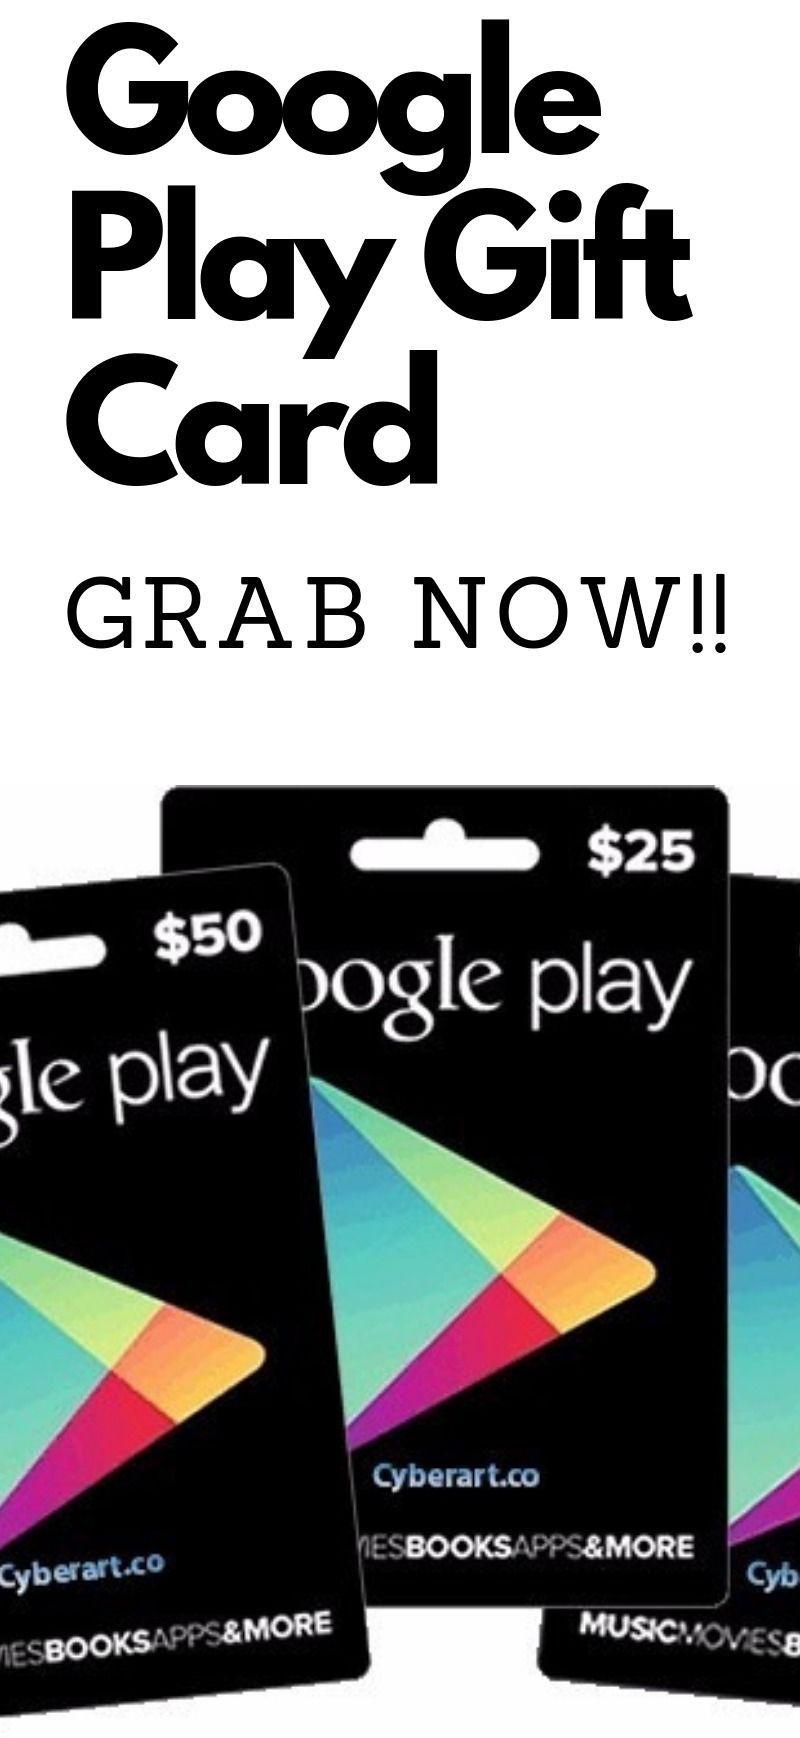 Free google play gift card giveaway 2020 google play